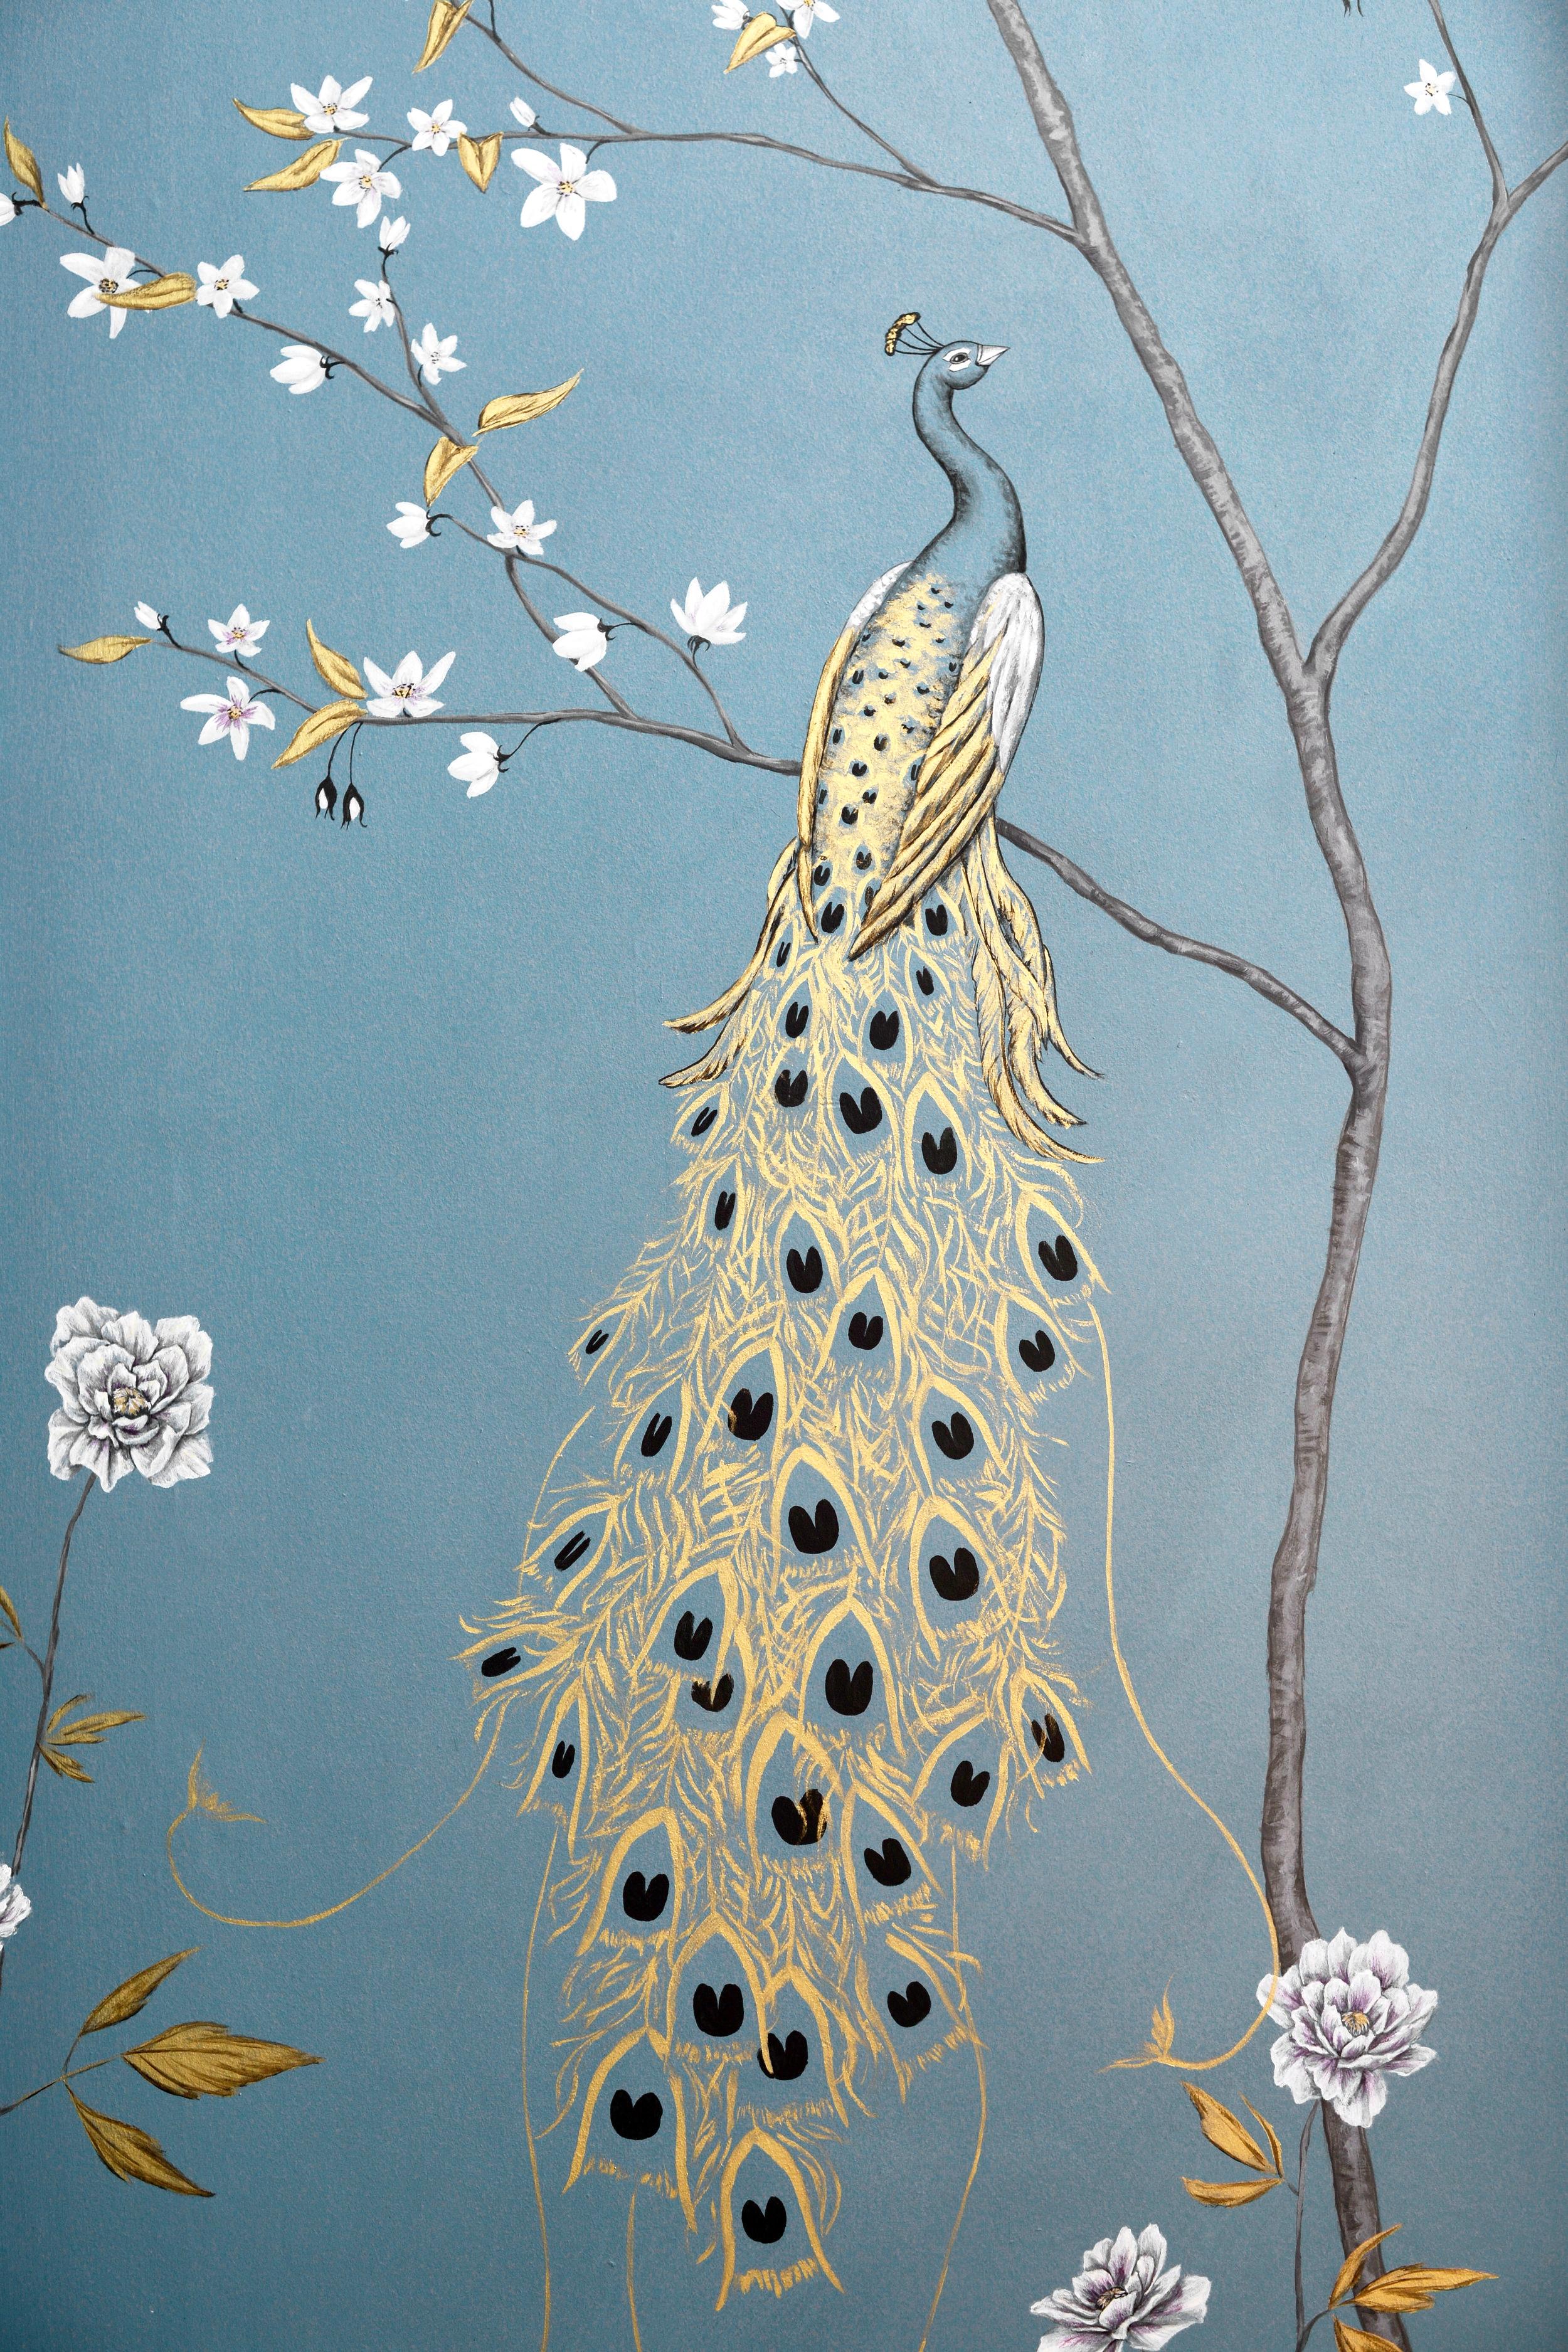 Fingest peacocks, wall mural, detail